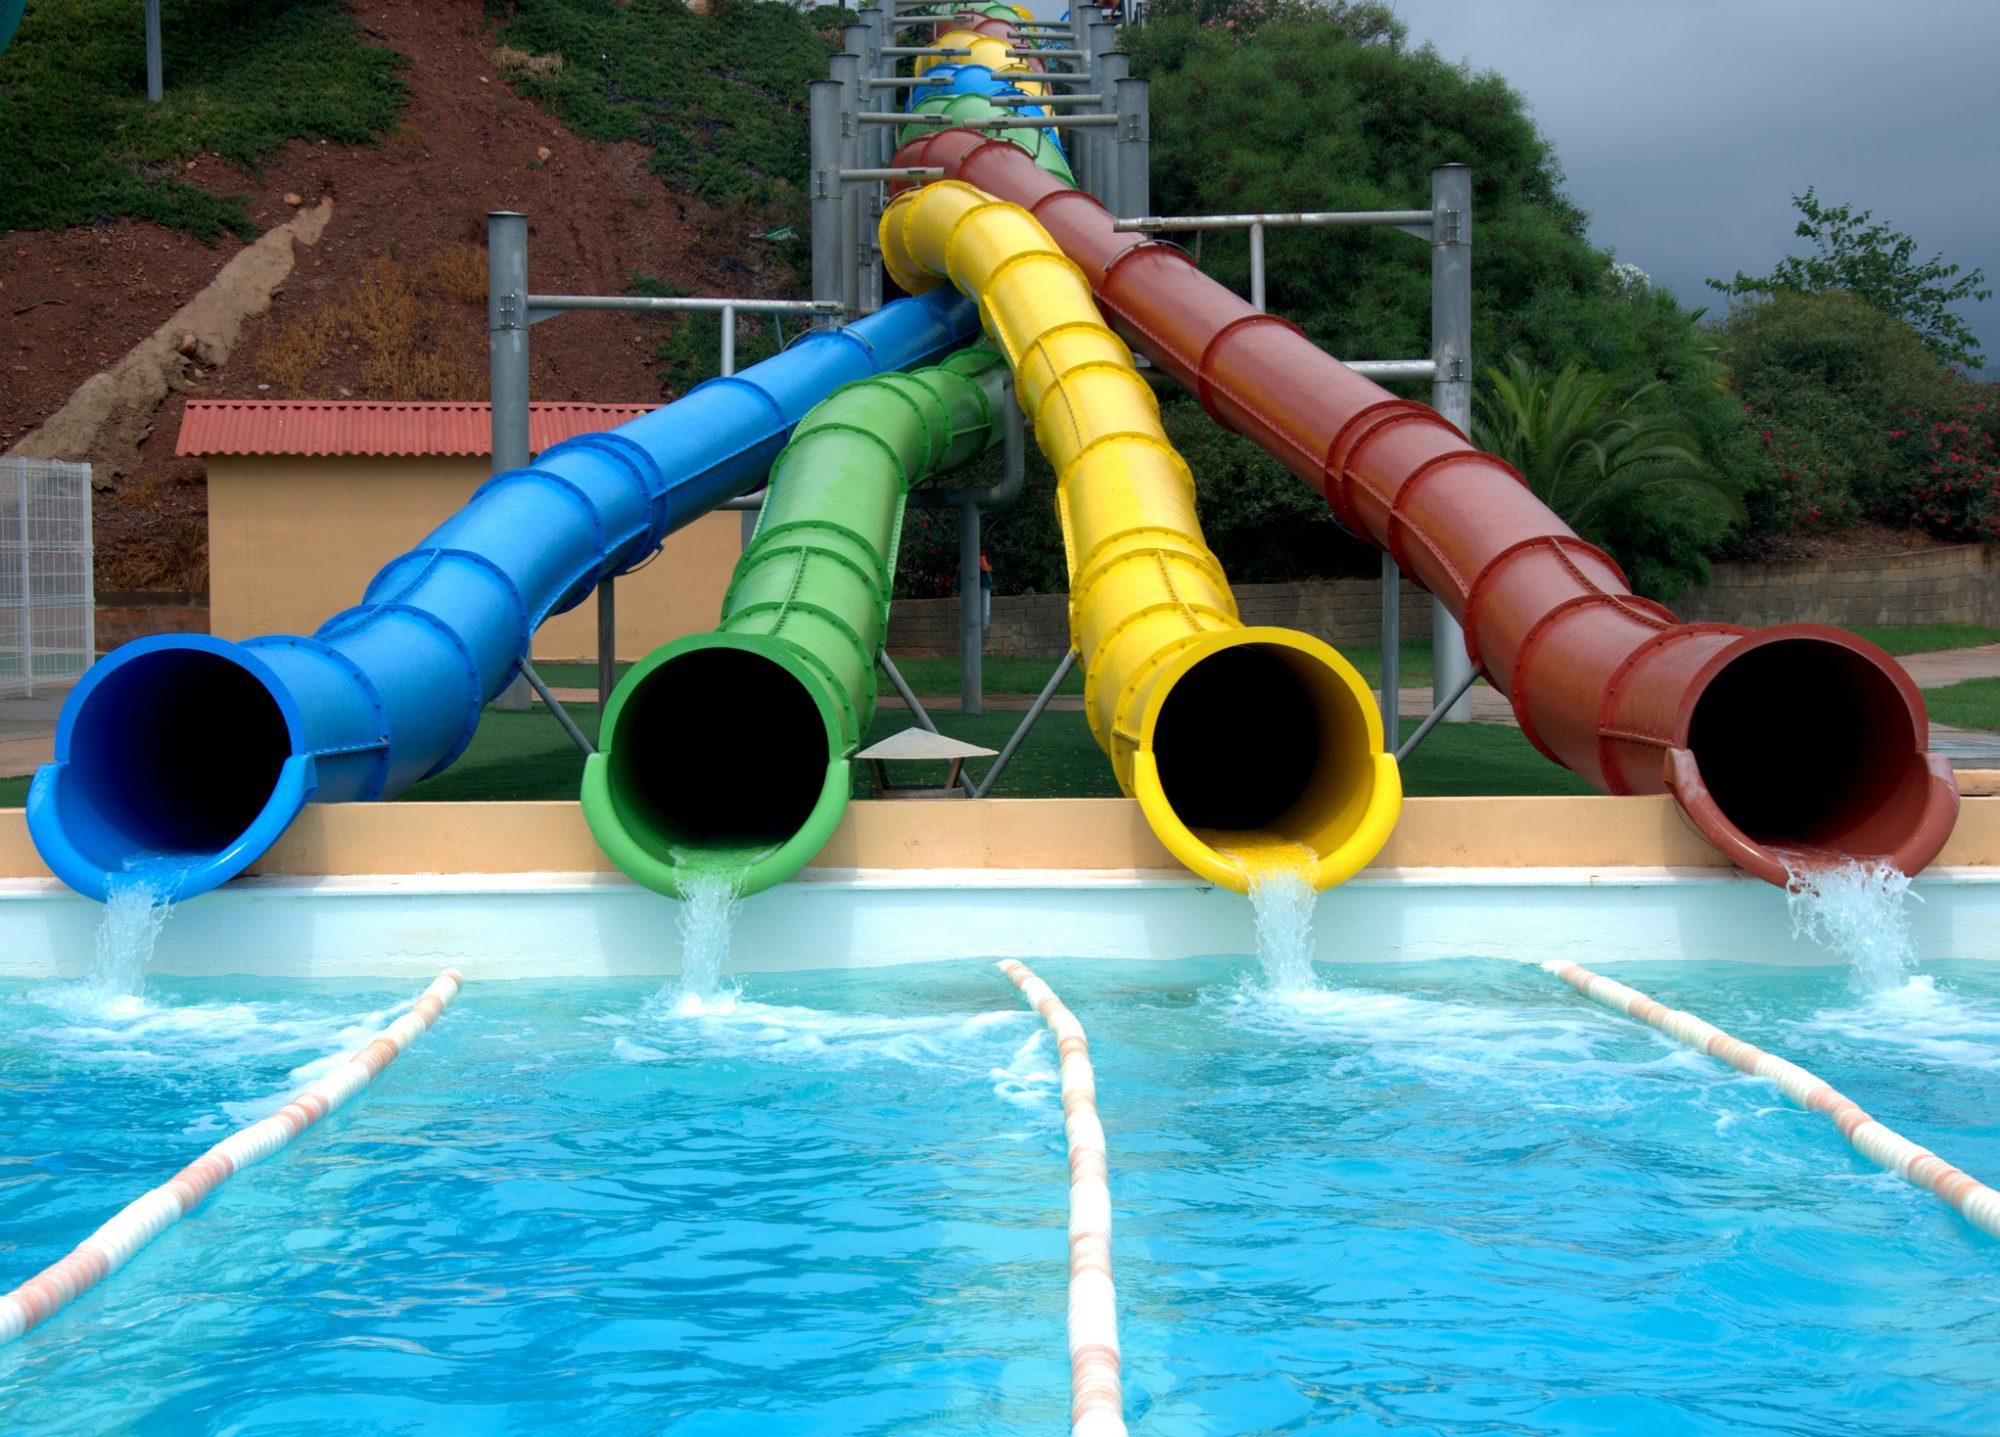 Water park slides